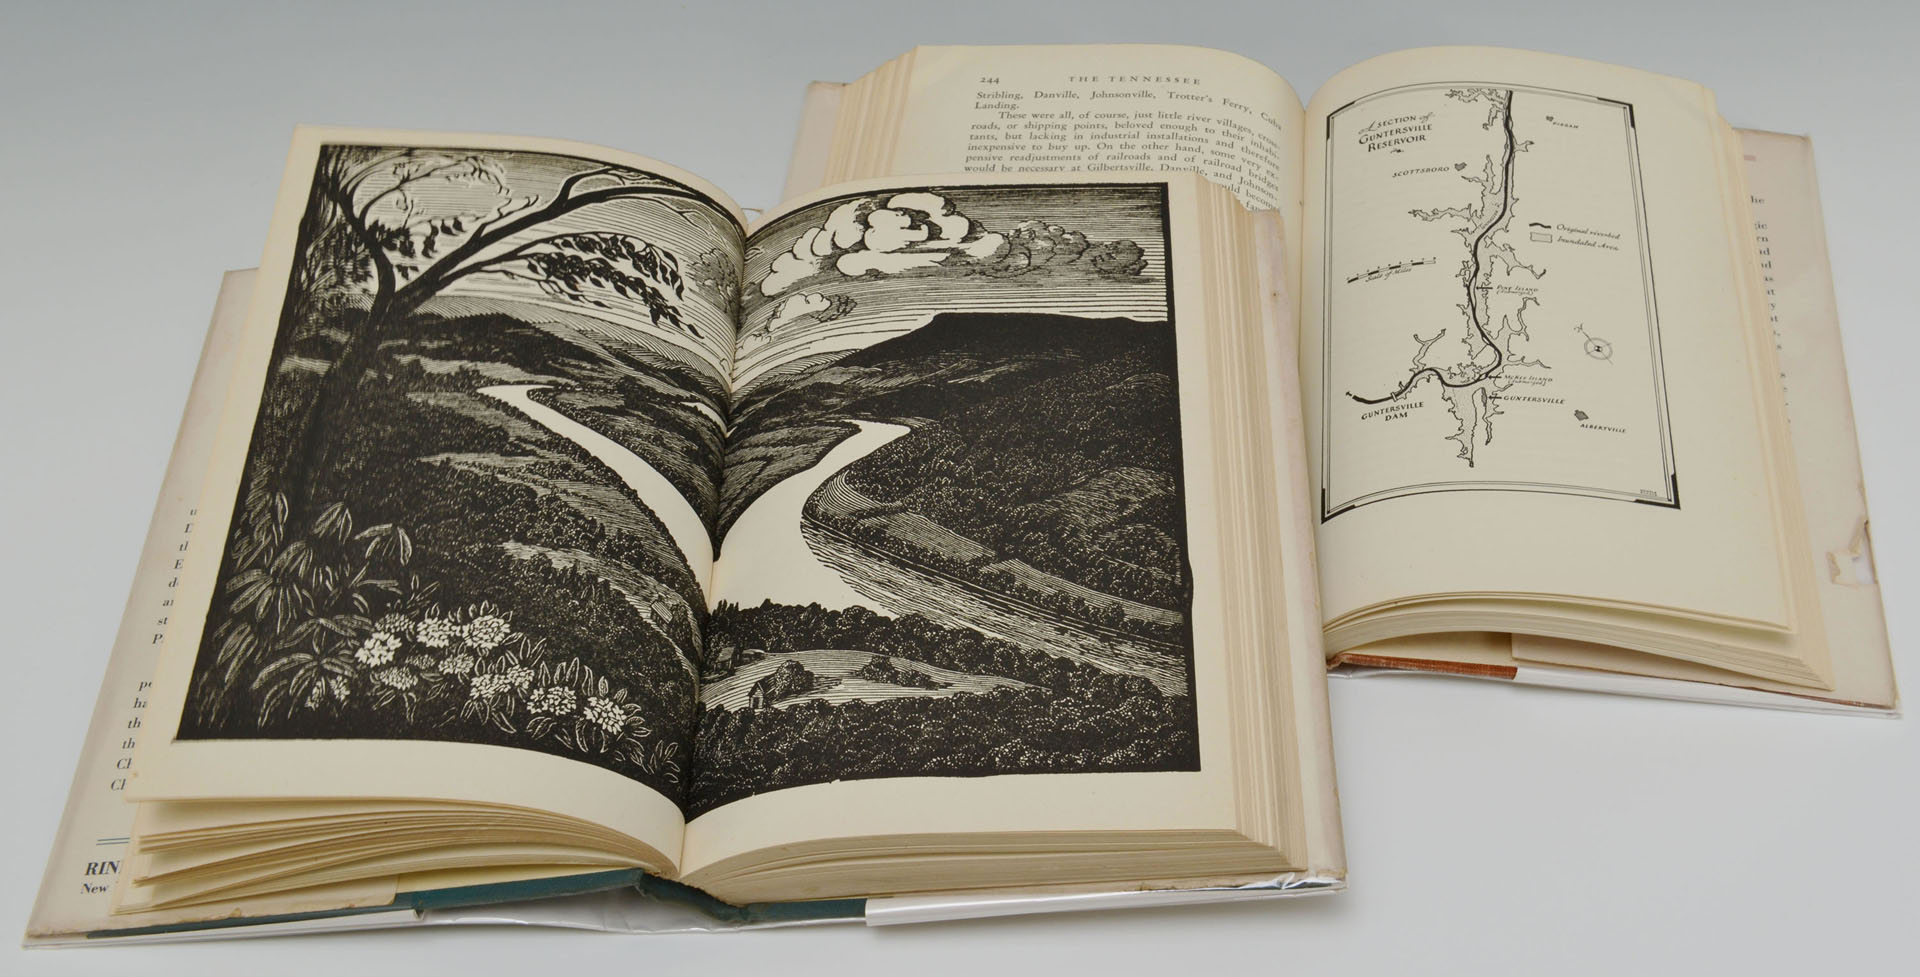 Lot 492: Theresa Davidson Woodblock Print and Books, 1 sign